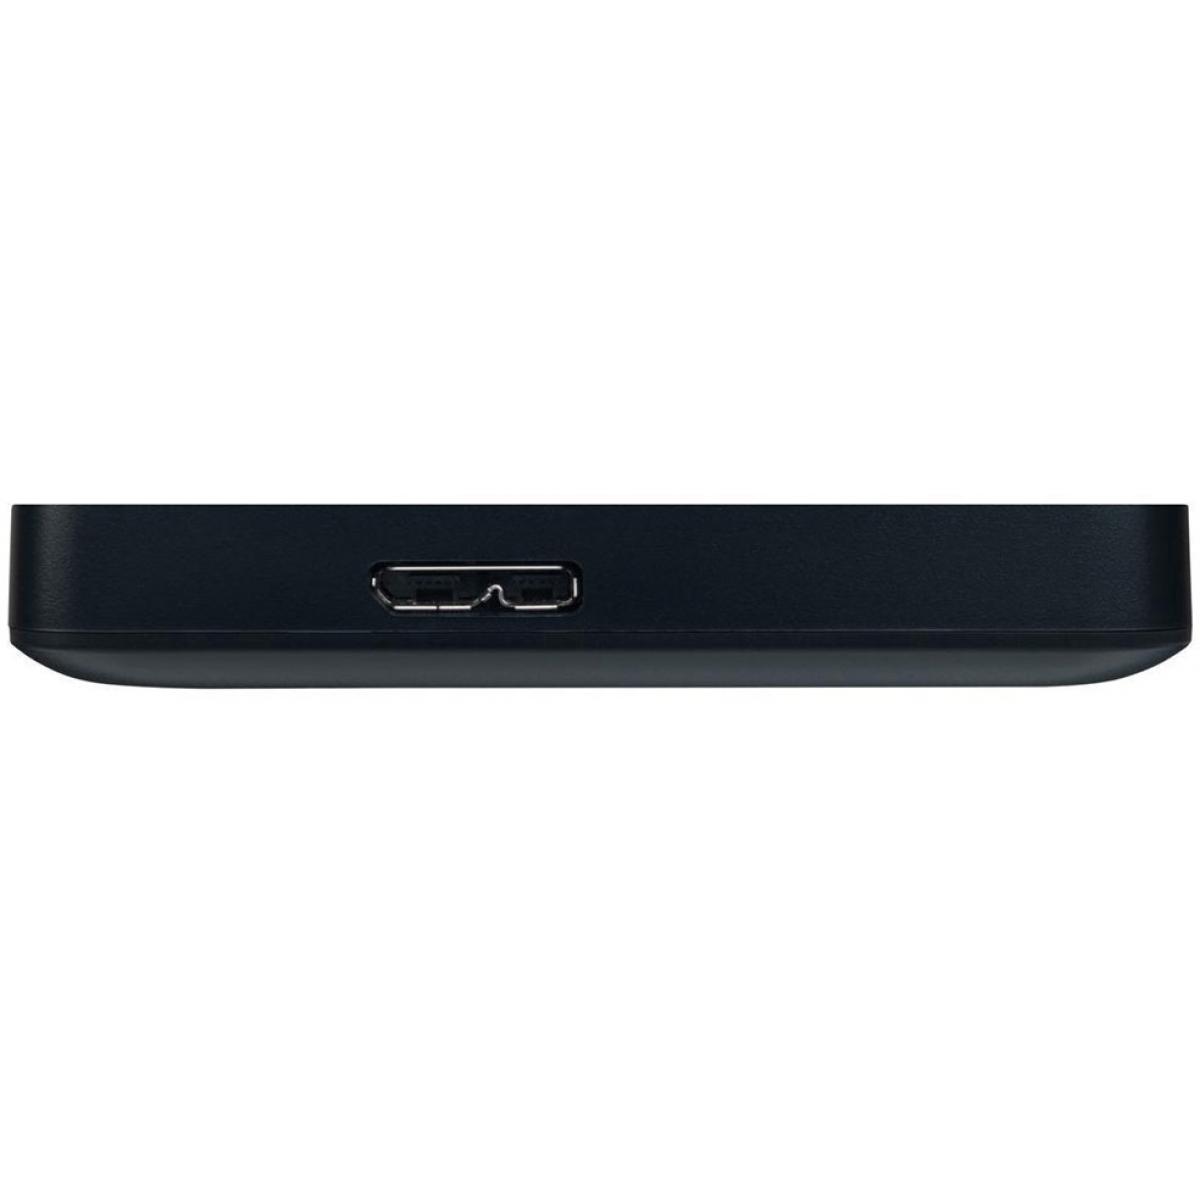 HD Externo Portátil Toshiba Canvio Basics 2TB HDTB420XK3AA USB 3.0 Preto